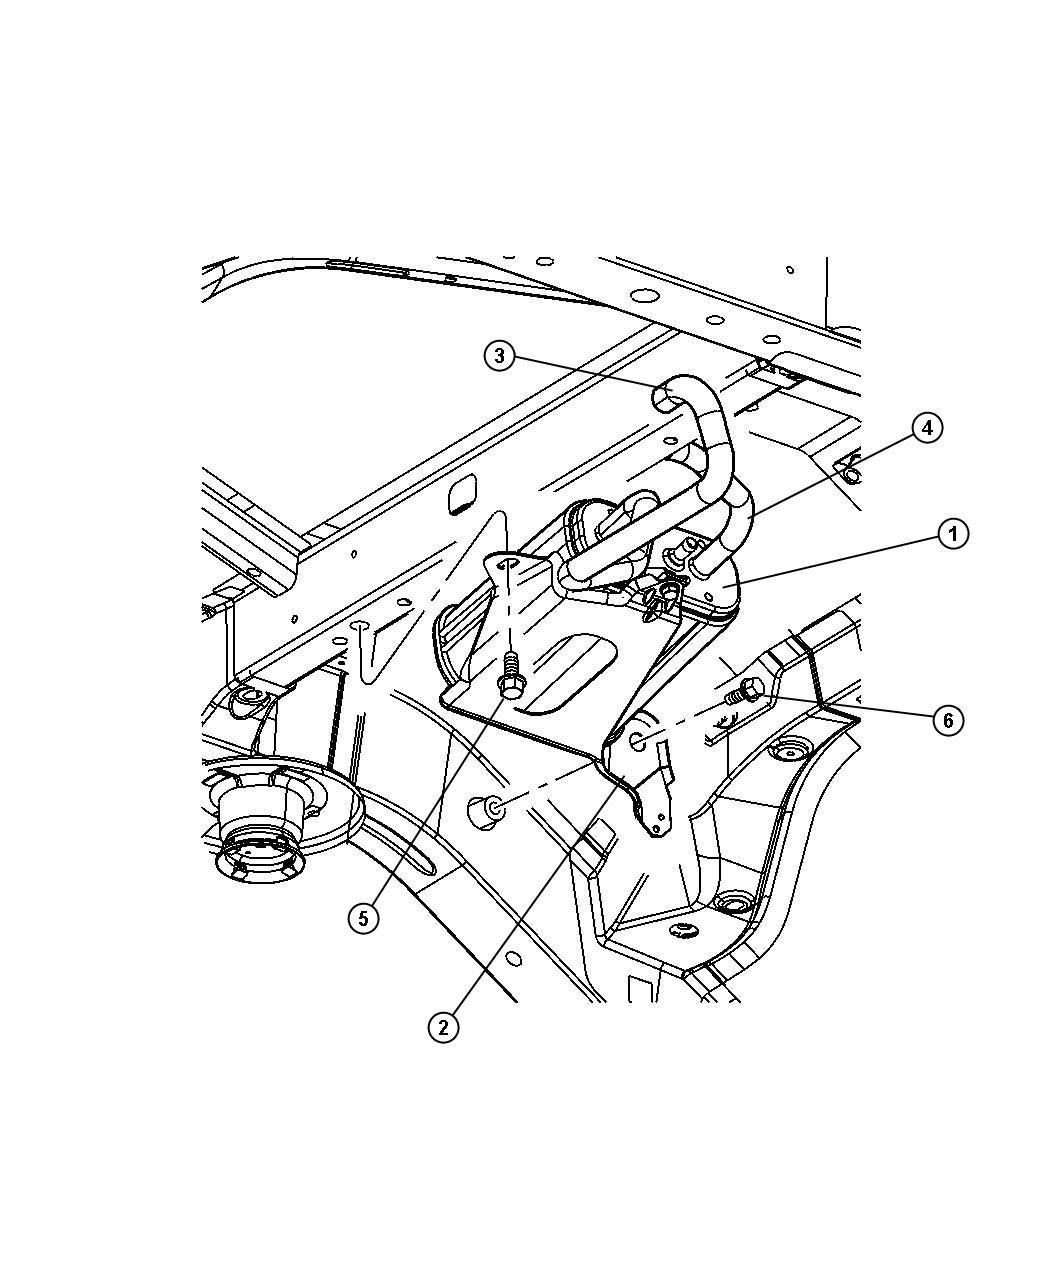 2005 Jeep Liberty Canister. Vapor. Pump, detection, leak